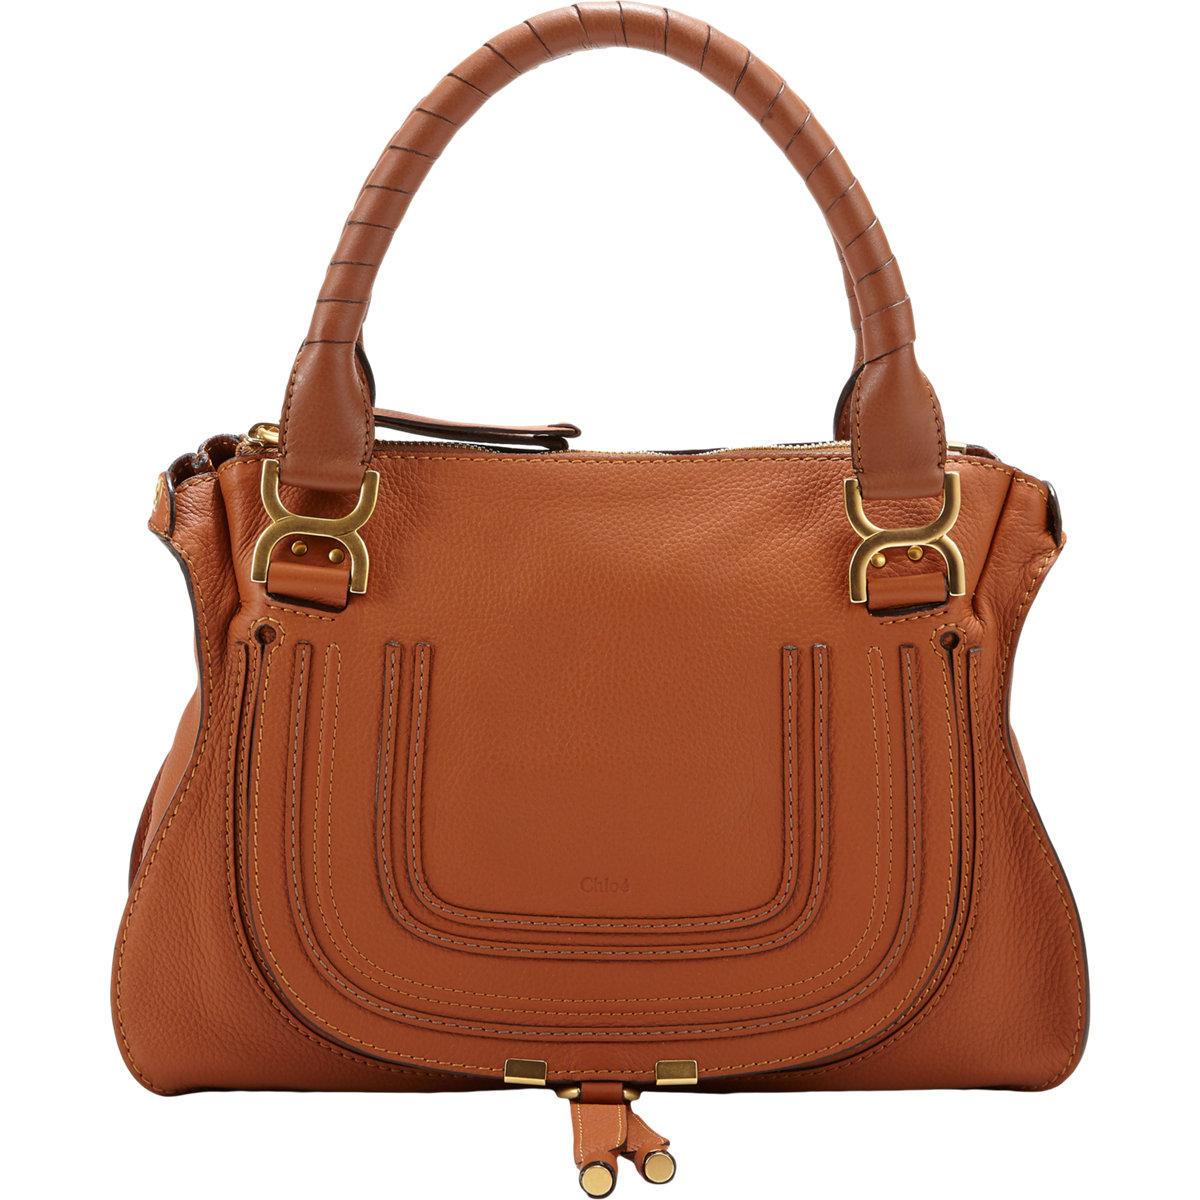 chlo marcie medium leather satchel in brown lyst. Black Bedroom Furniture Sets. Home Design Ideas